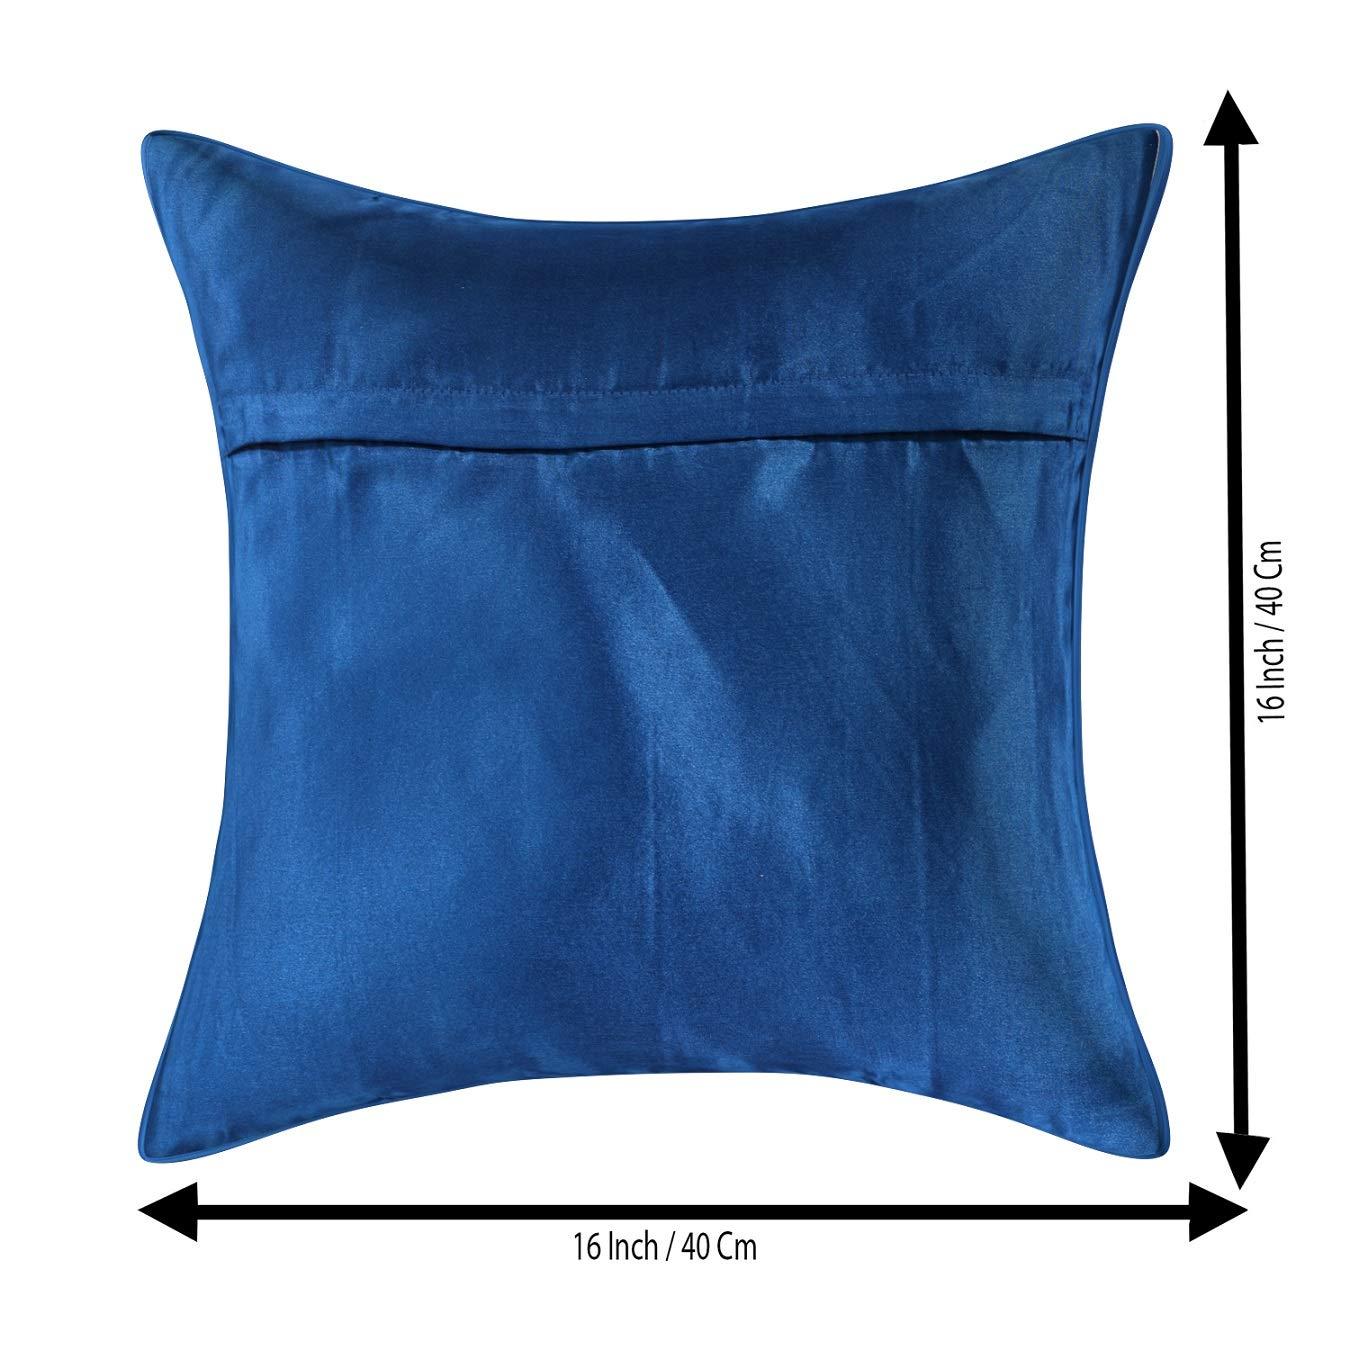 Kess InHouse Carina Povarchik Guardian Angel Blue Multicolor Bed Runner